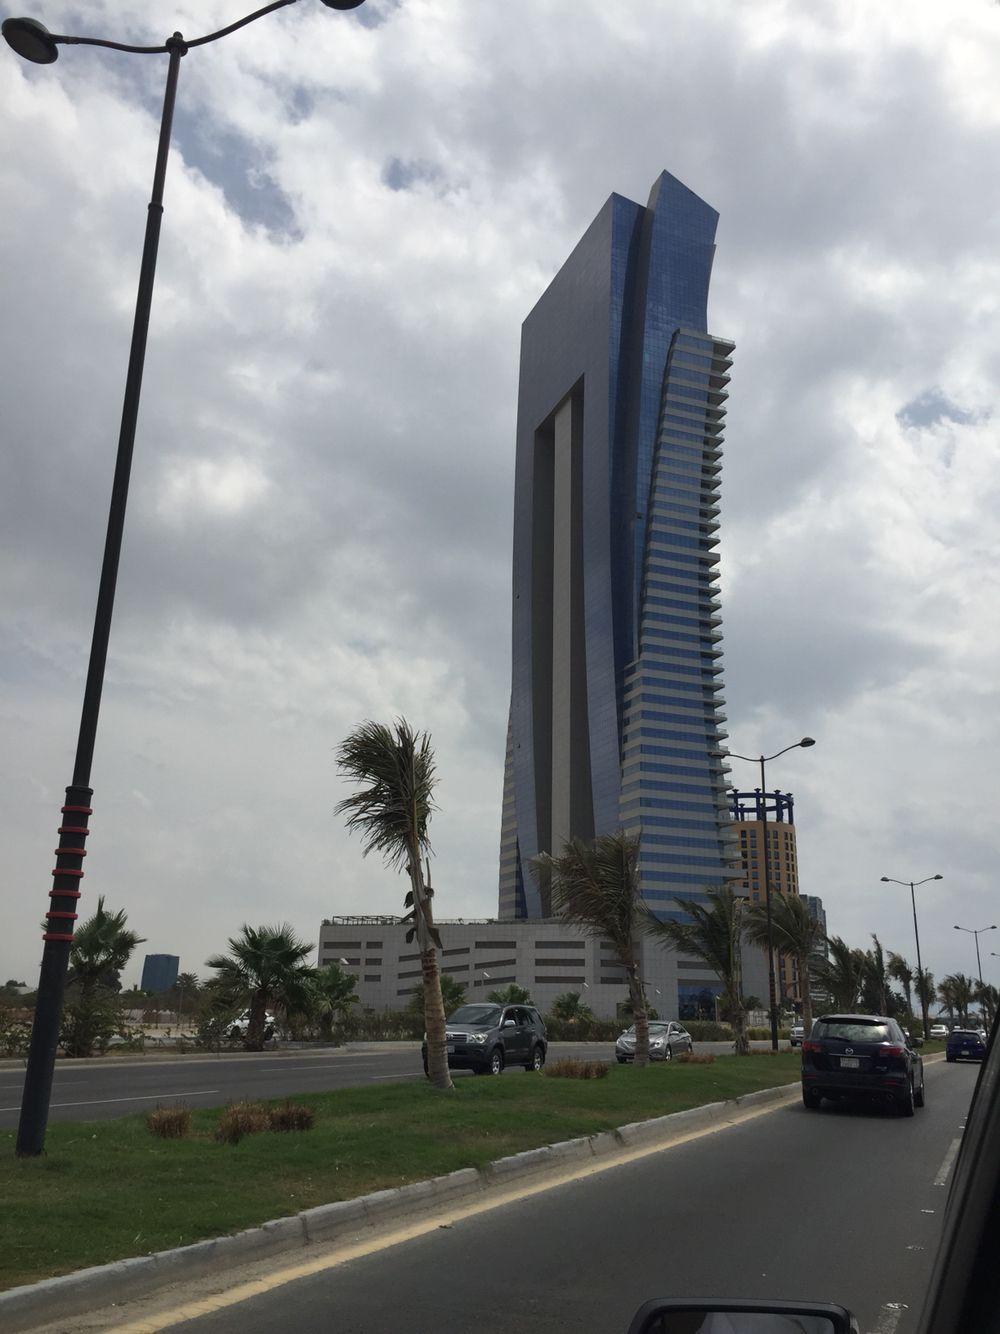 Buildings in jeddah saudi arabia image by amany ghozlan